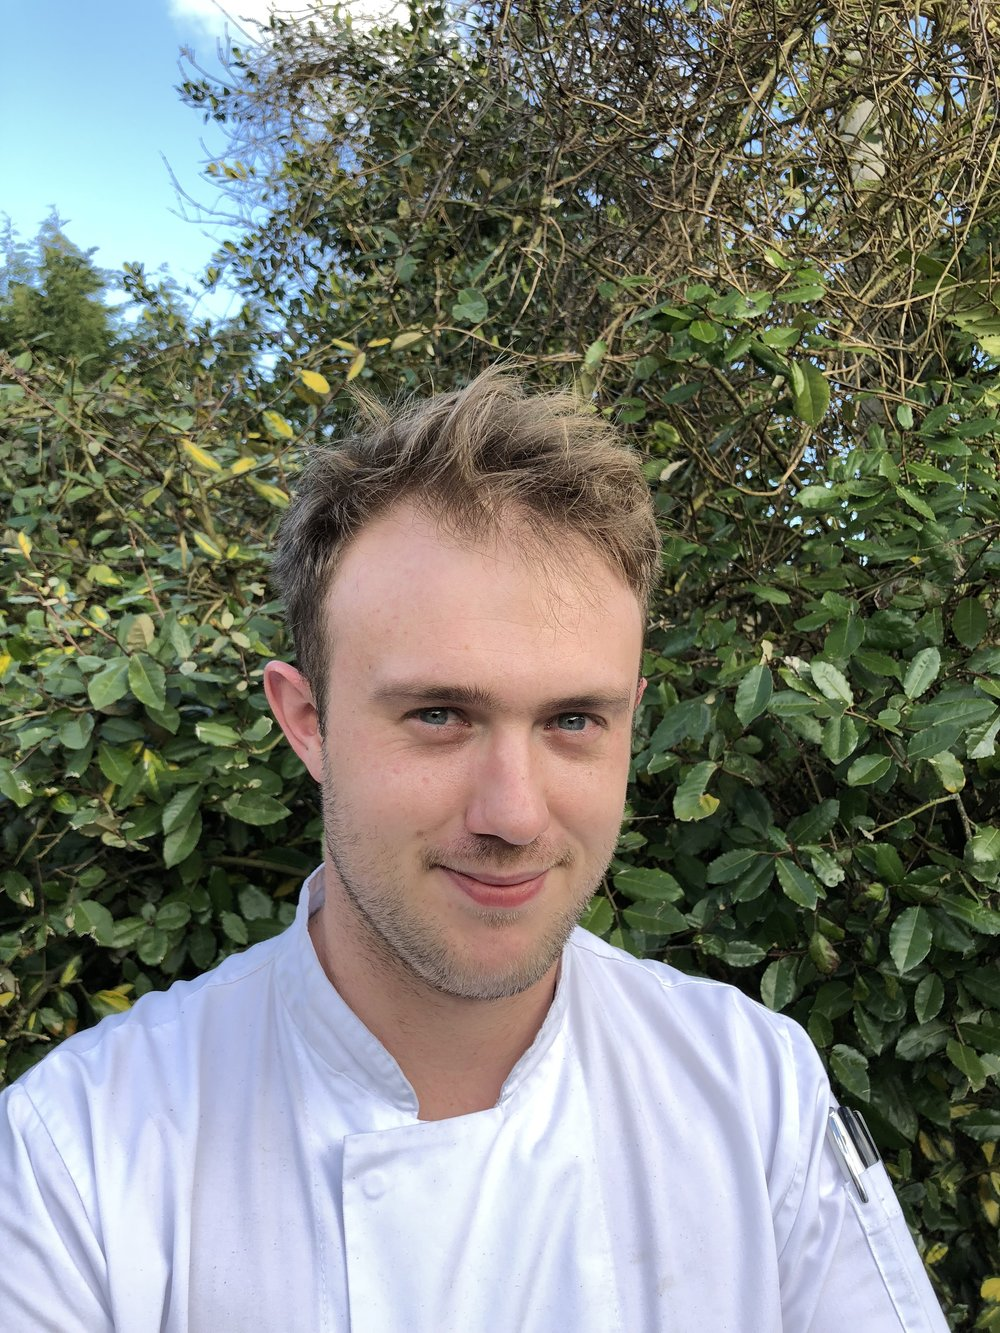 Luke Foreacre - Head Chef & Director